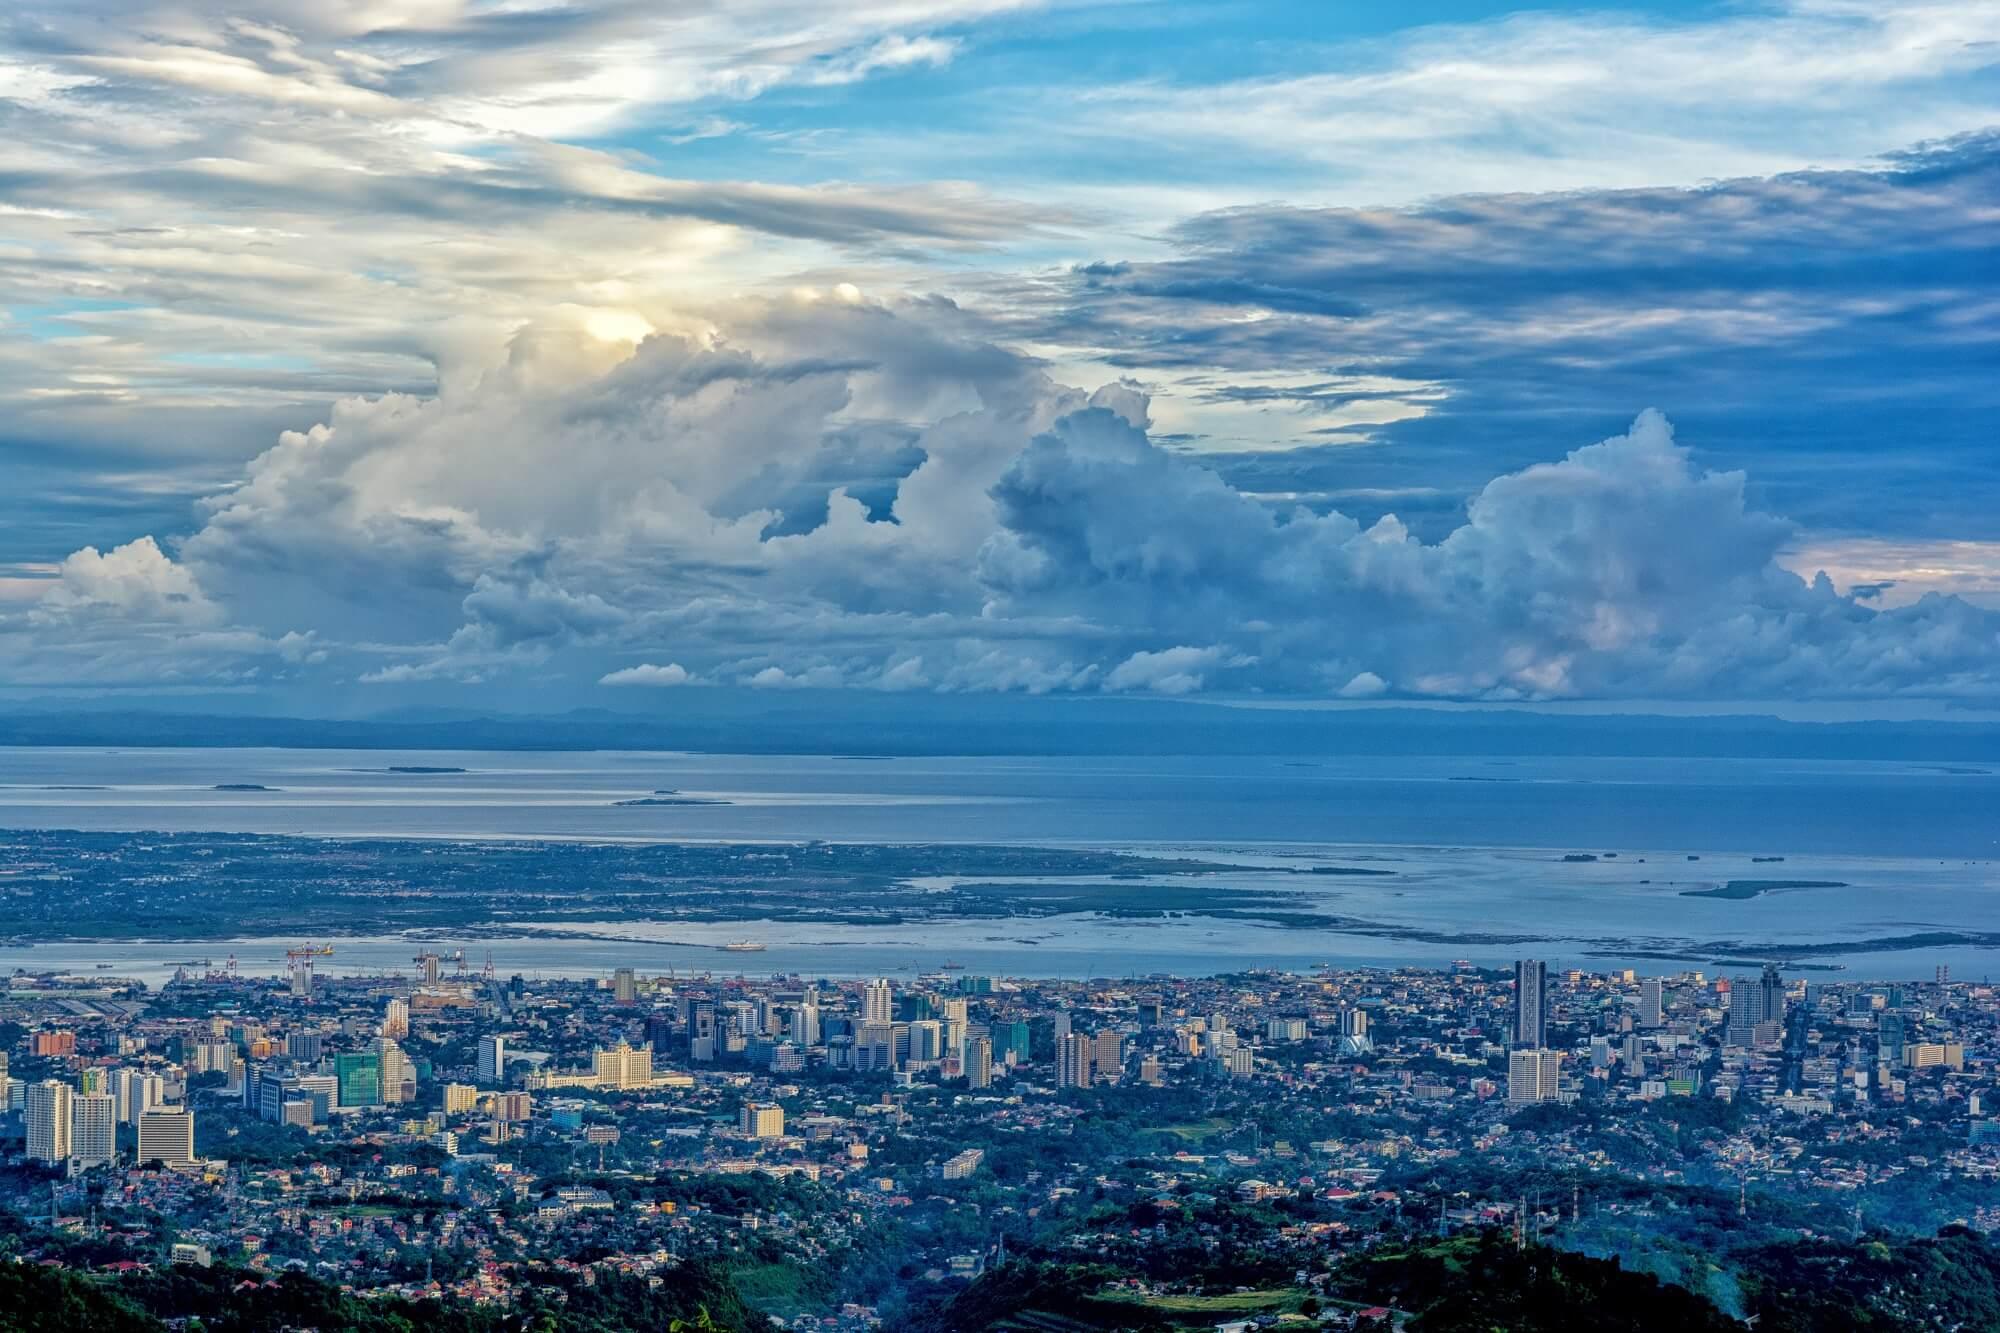 IT-BPM among key economic drivers in Cebu